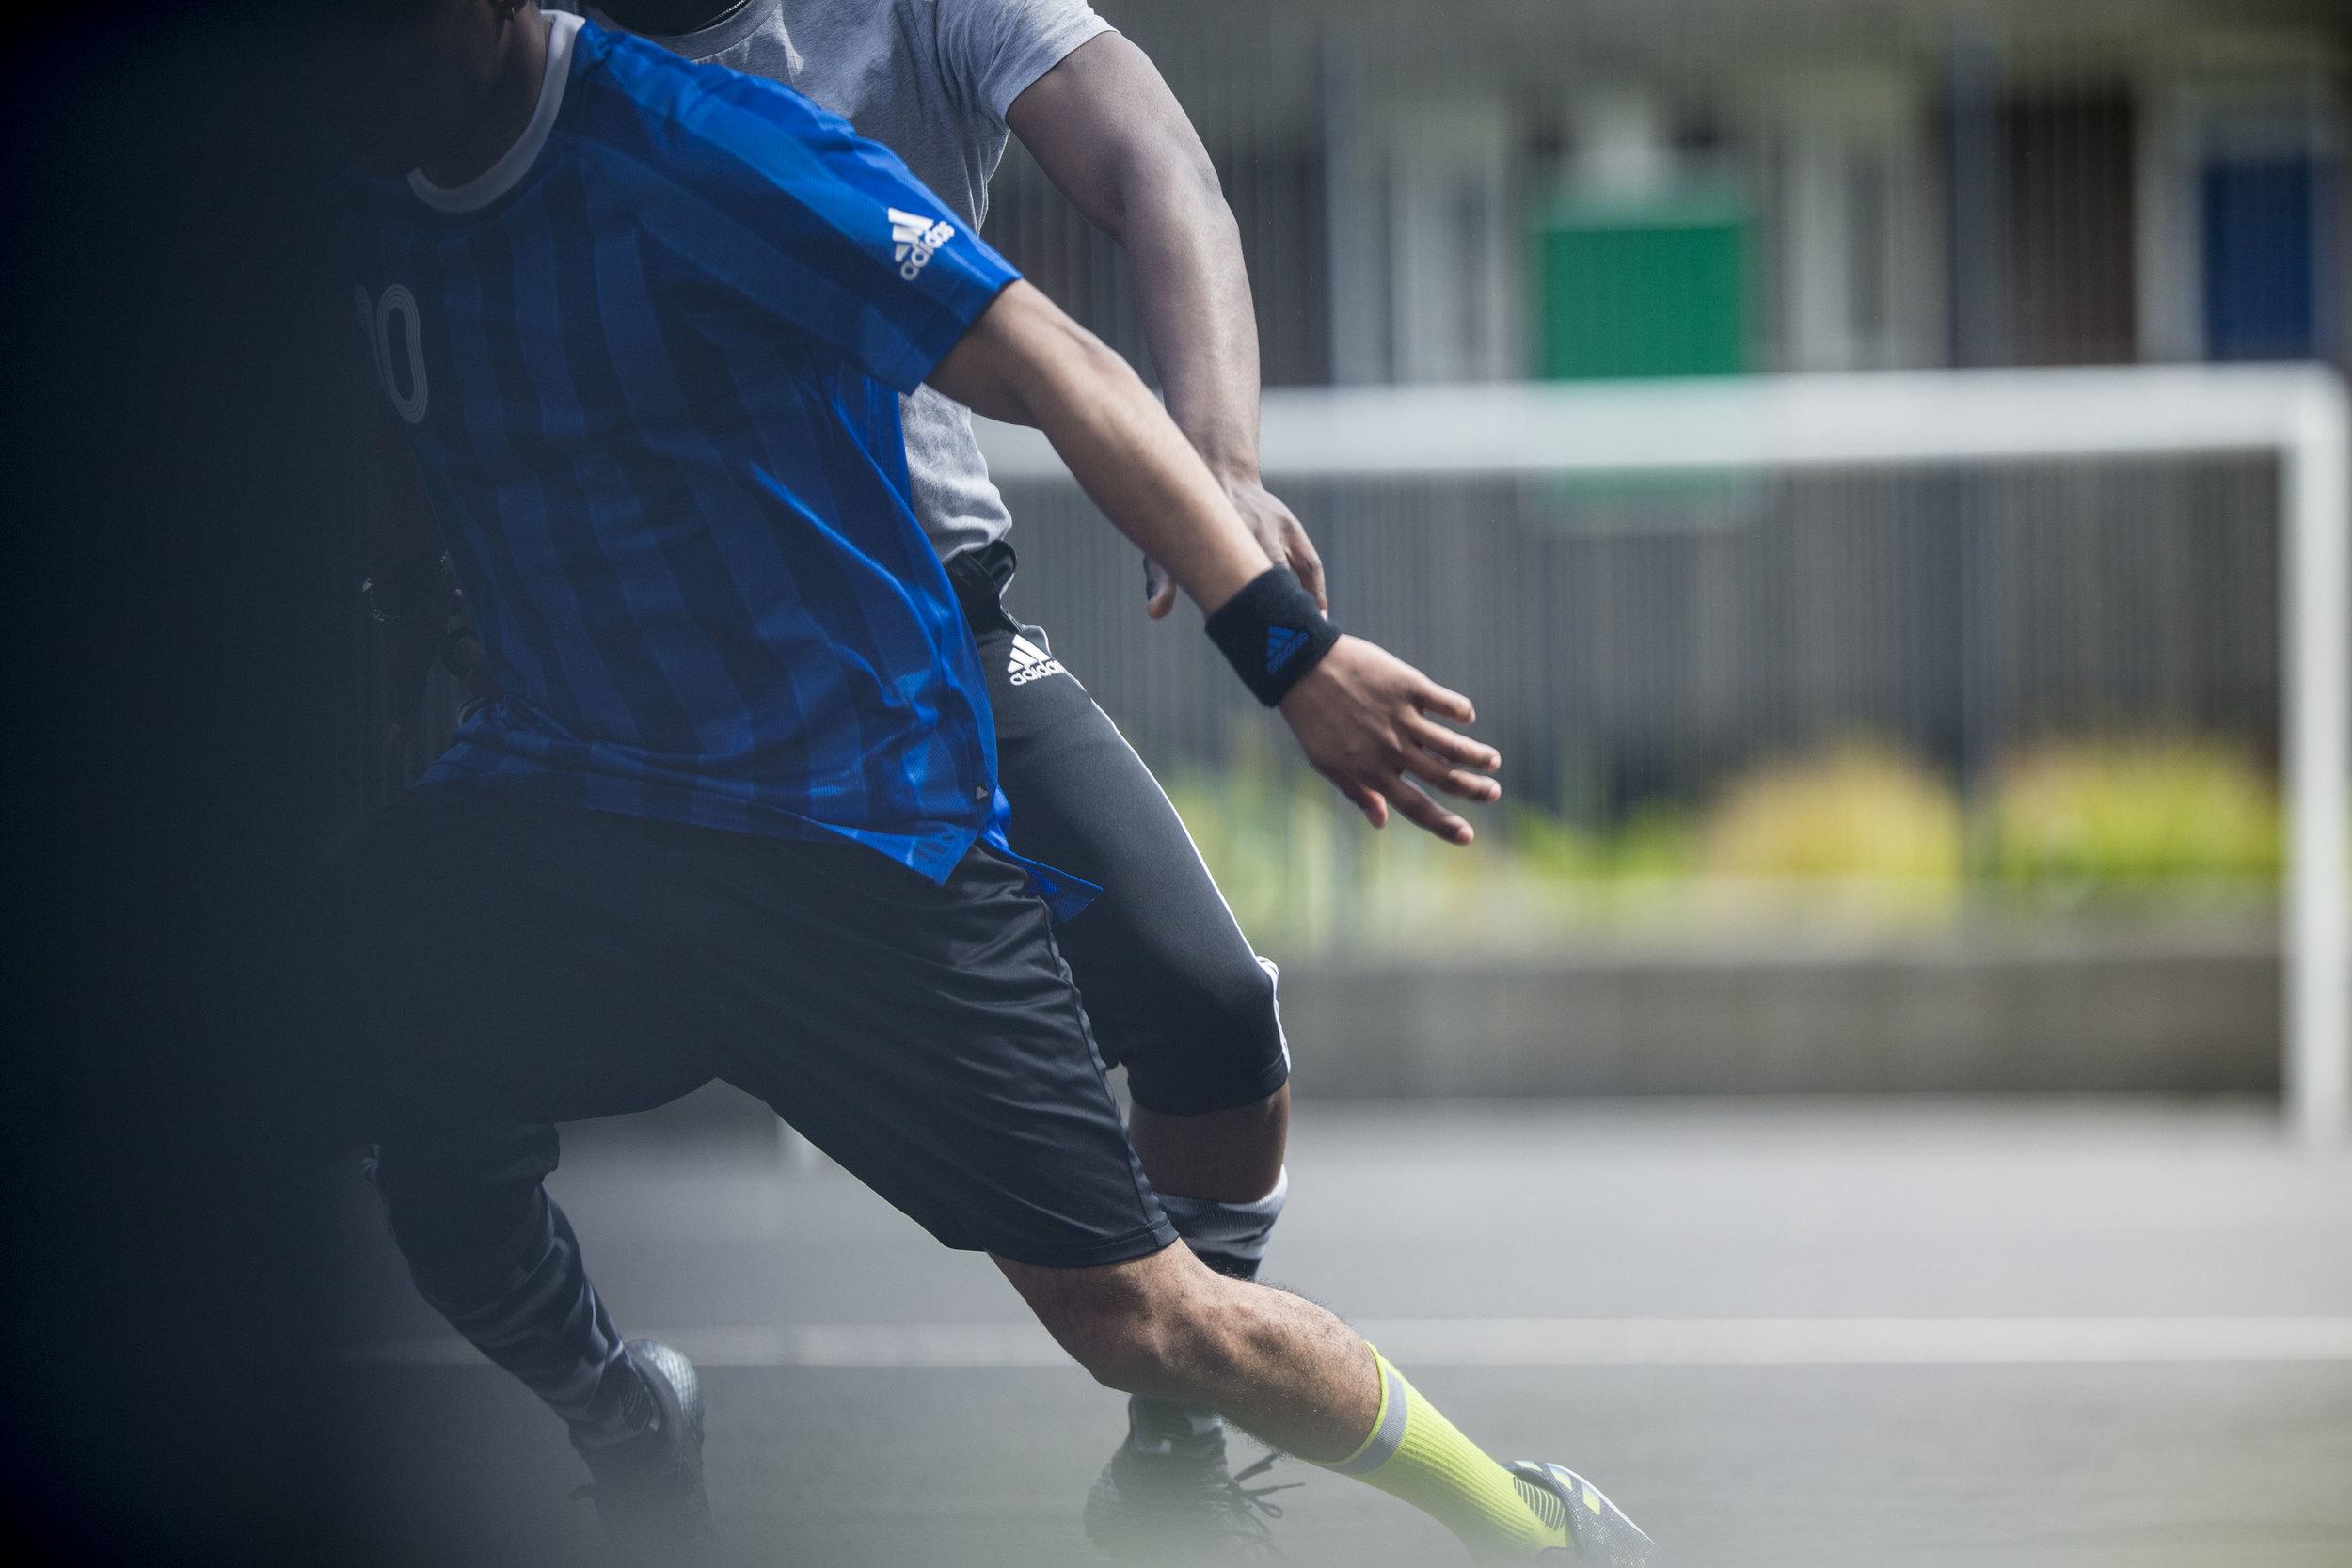 Adidas_Street_Football_Shot_03_Action_0973.jpg